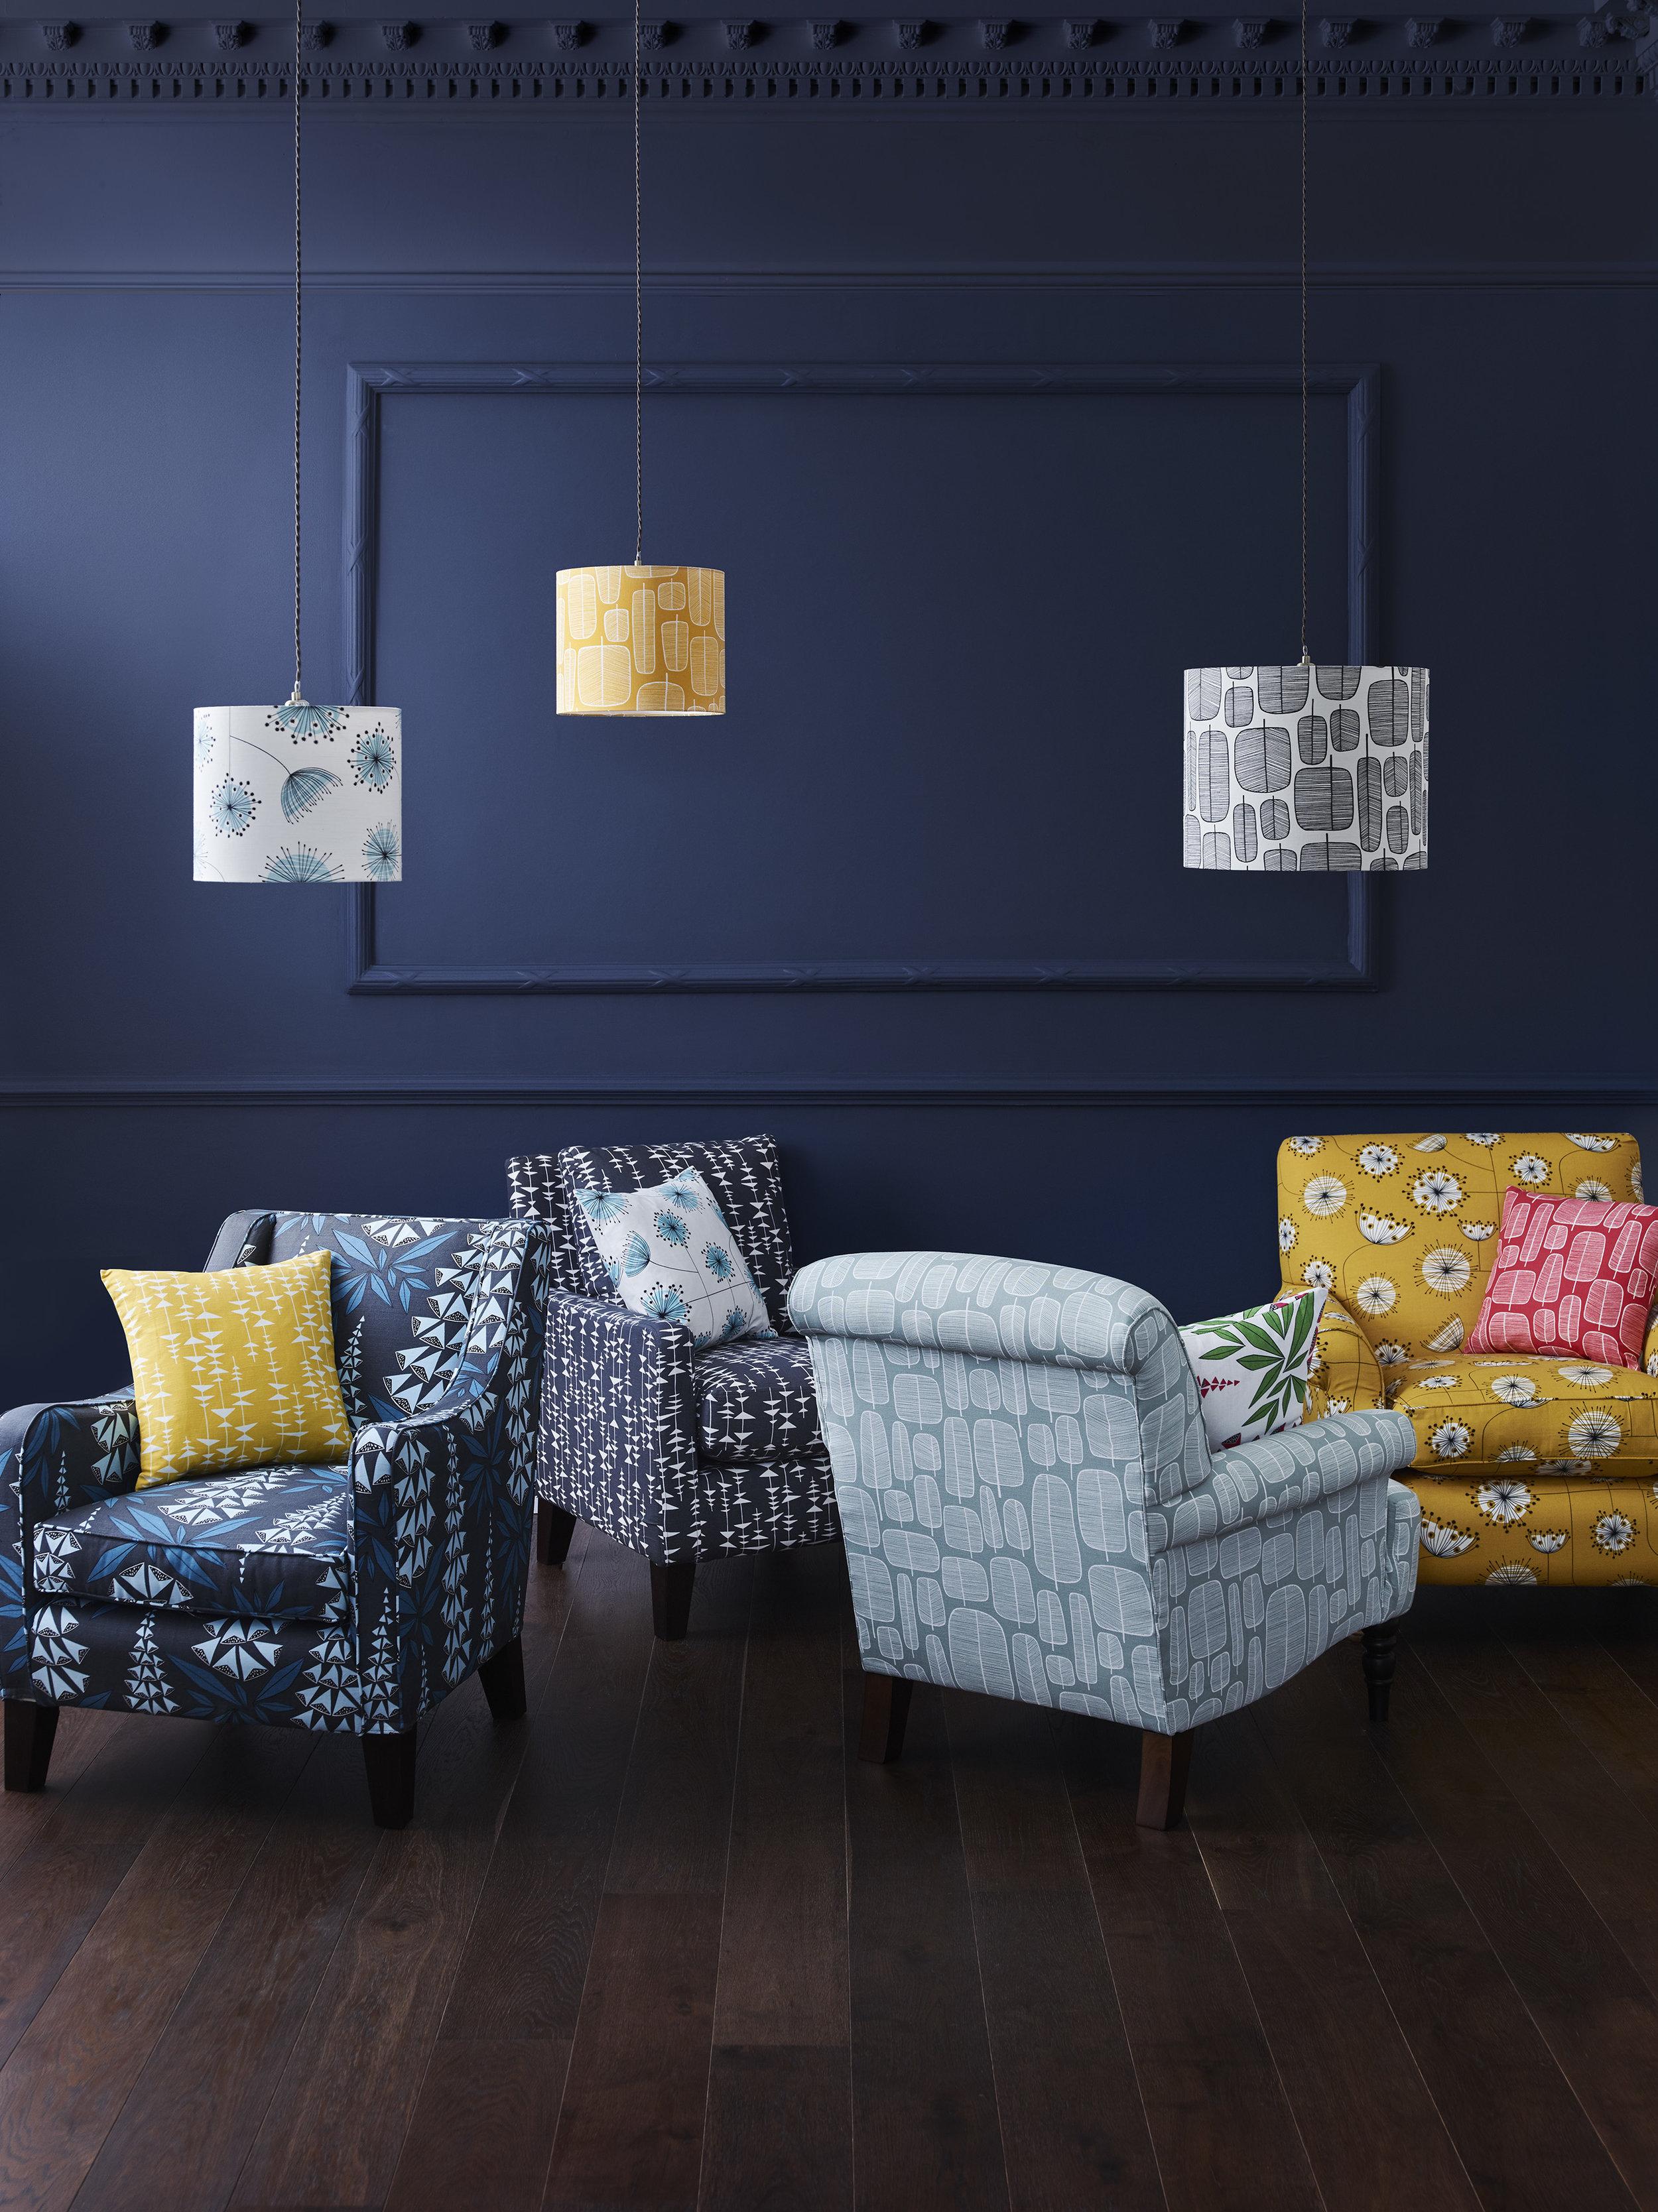 Alpine chair in Foxglove Boleyn Fabric £1129, Alfie Chair in Ditto Liquorice Fabric £1049, Ambleside Chair in Garden City Putty Rouge Fabric £1299, Halstead Chair in Dandelion Mobile Sunflower Yellow and White Fabric £889.